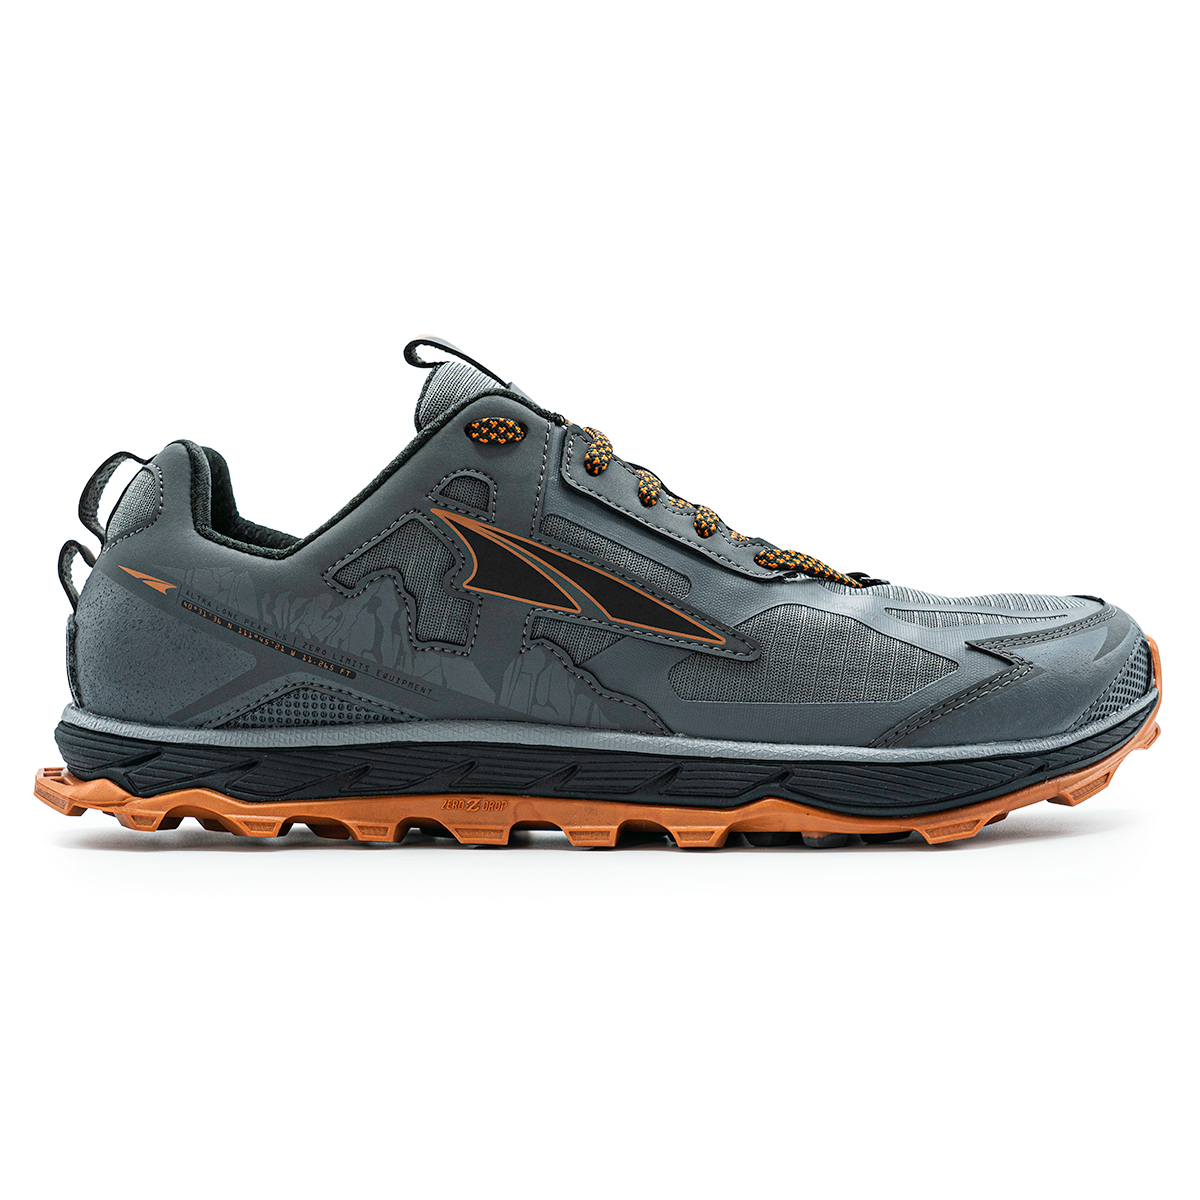 Men's Altra Lone Peak 4.5 Low Trail Running Shoe - Color: Gray/Orange - Size: 10 - Width: Regular, Gray/Orange, large, image 1